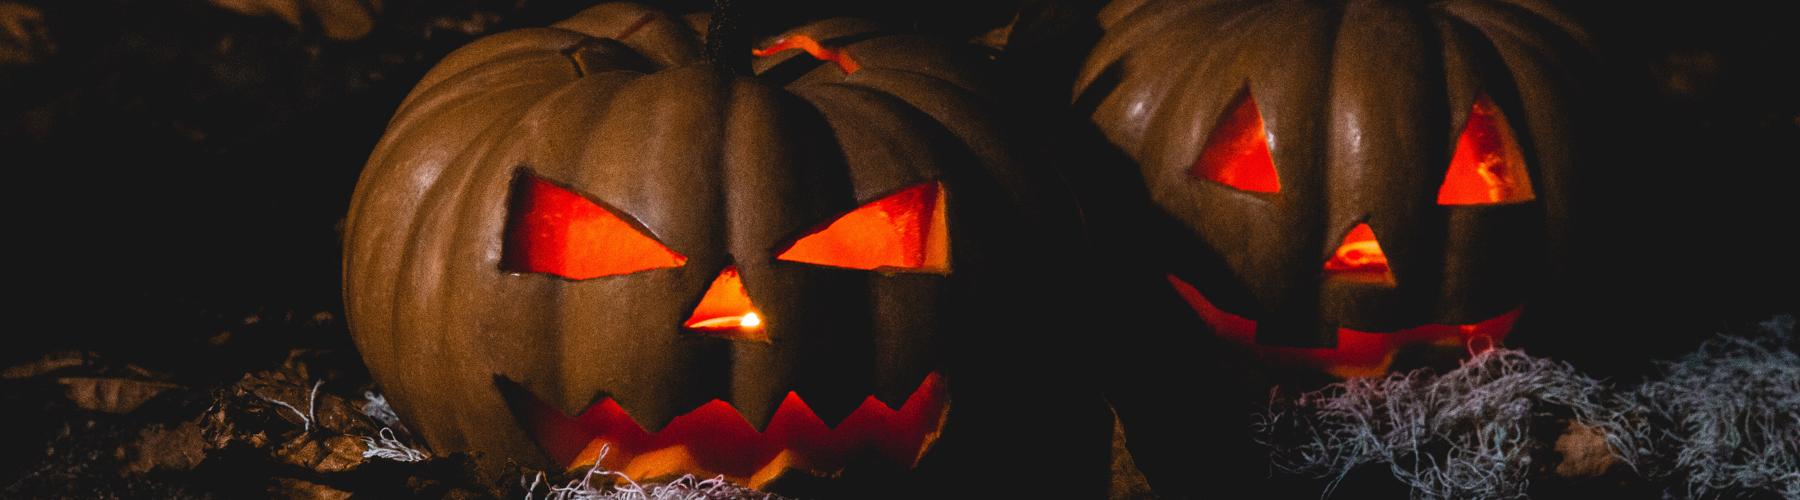 6 campagnes de marketing effrayantes pour Halloween